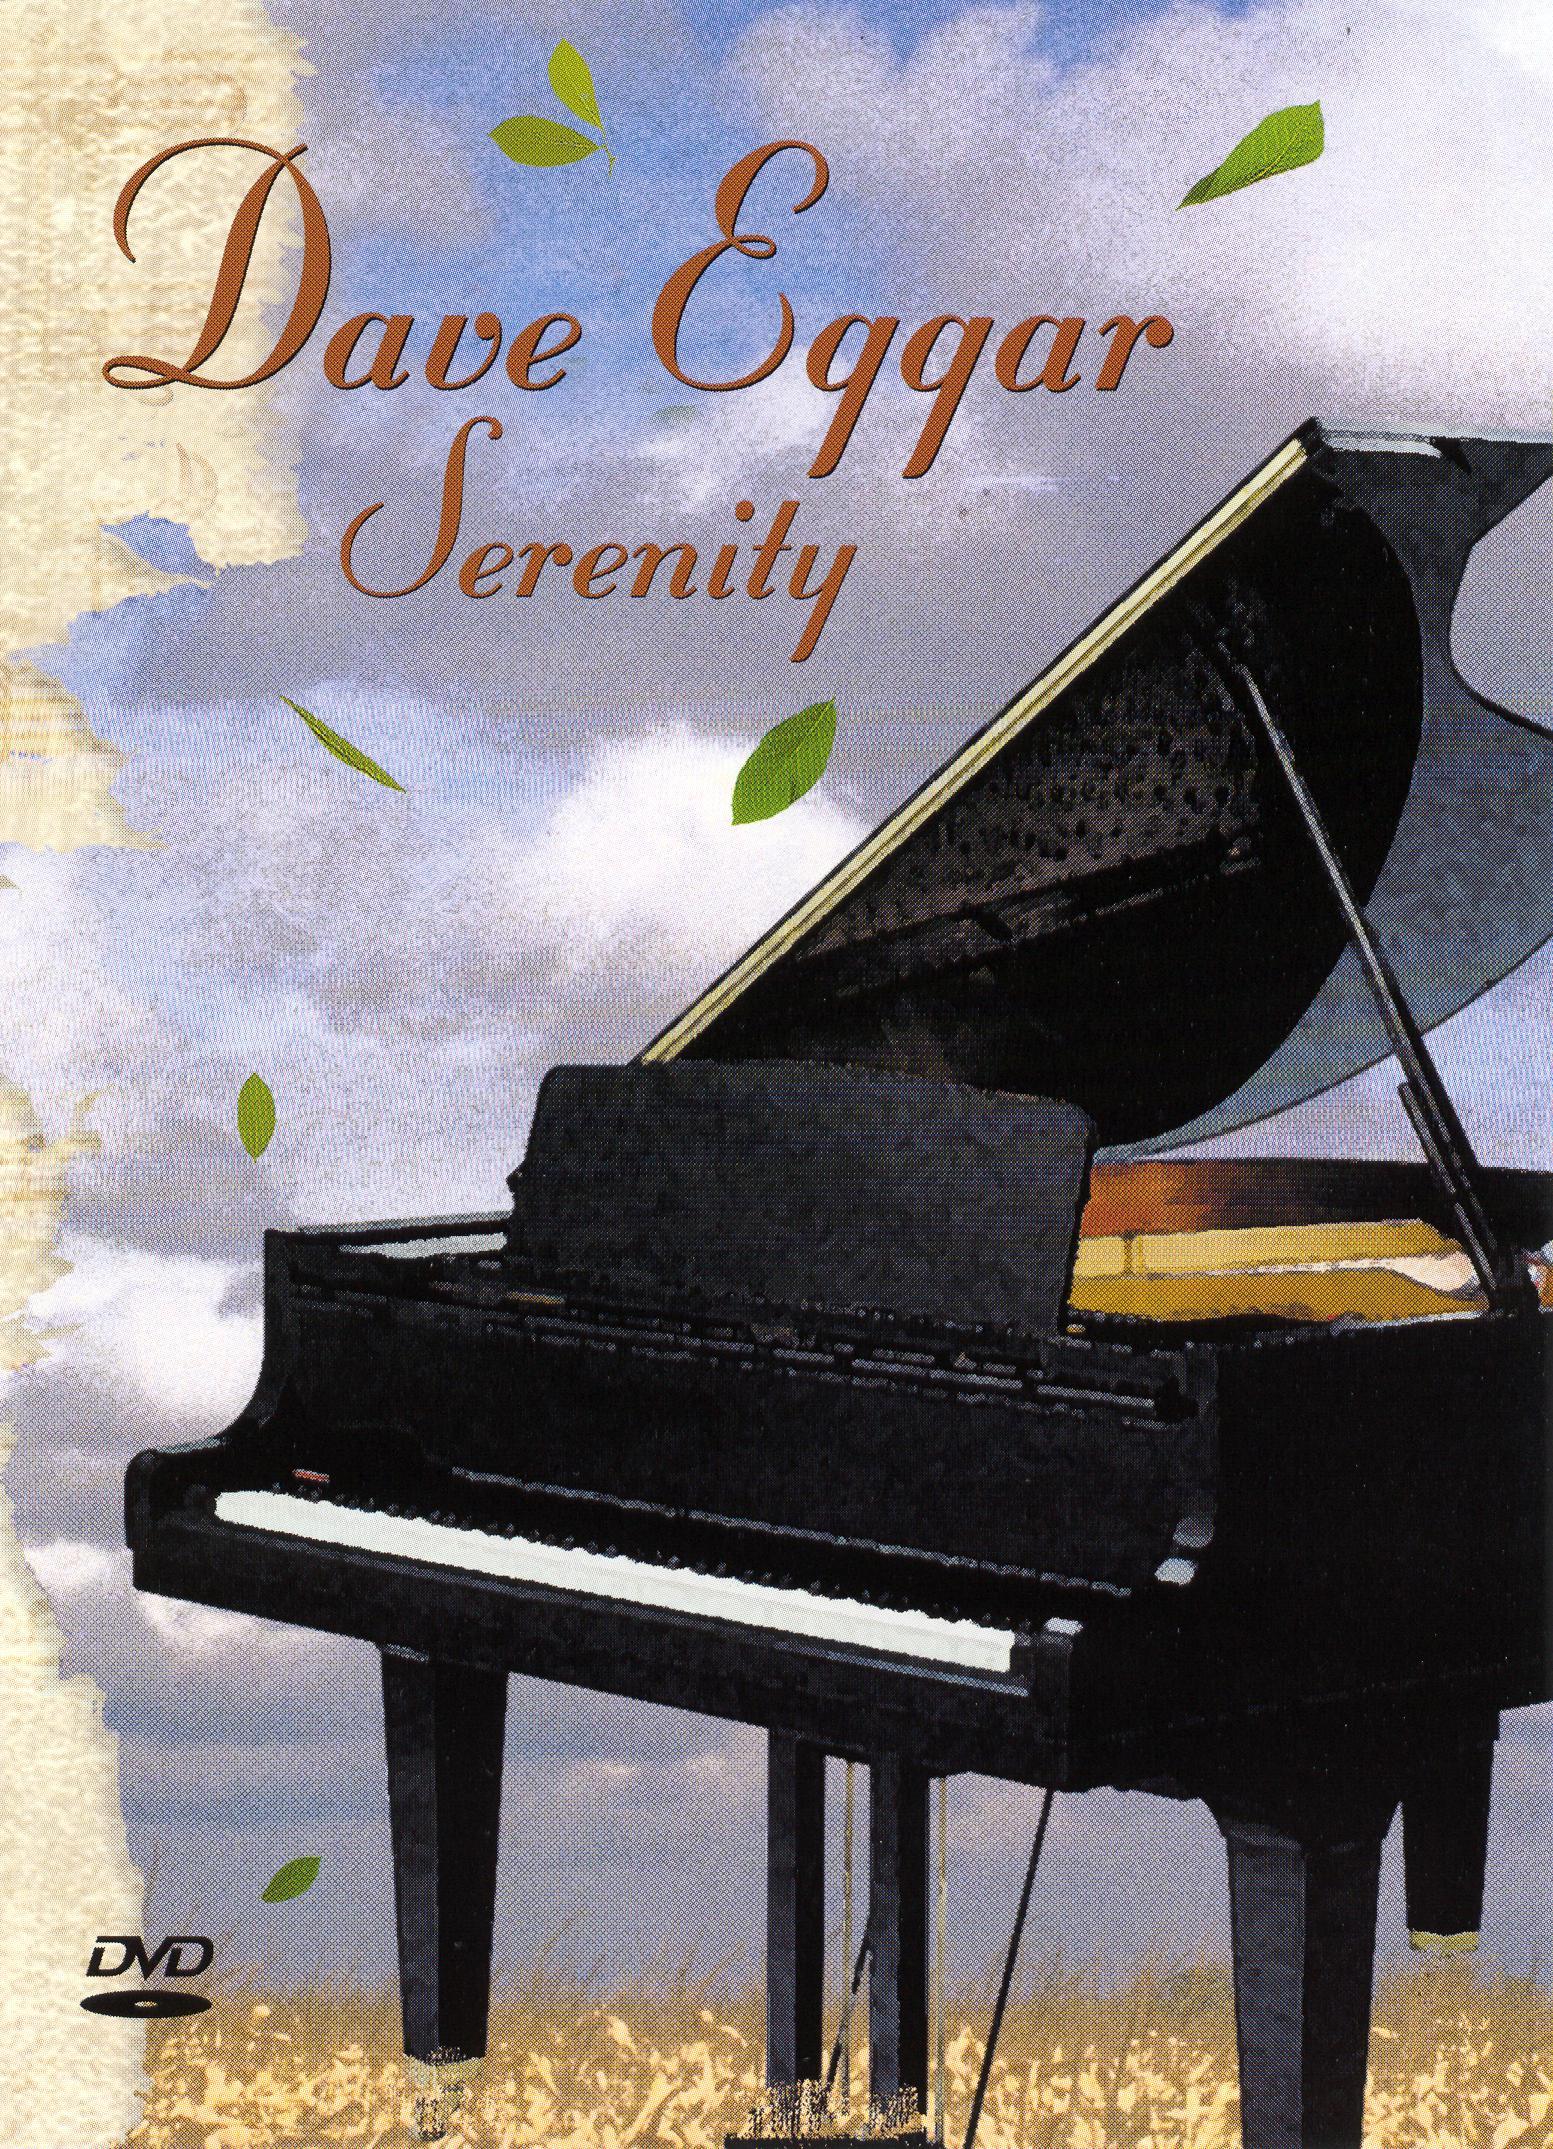 Dave Eggar: Serenity